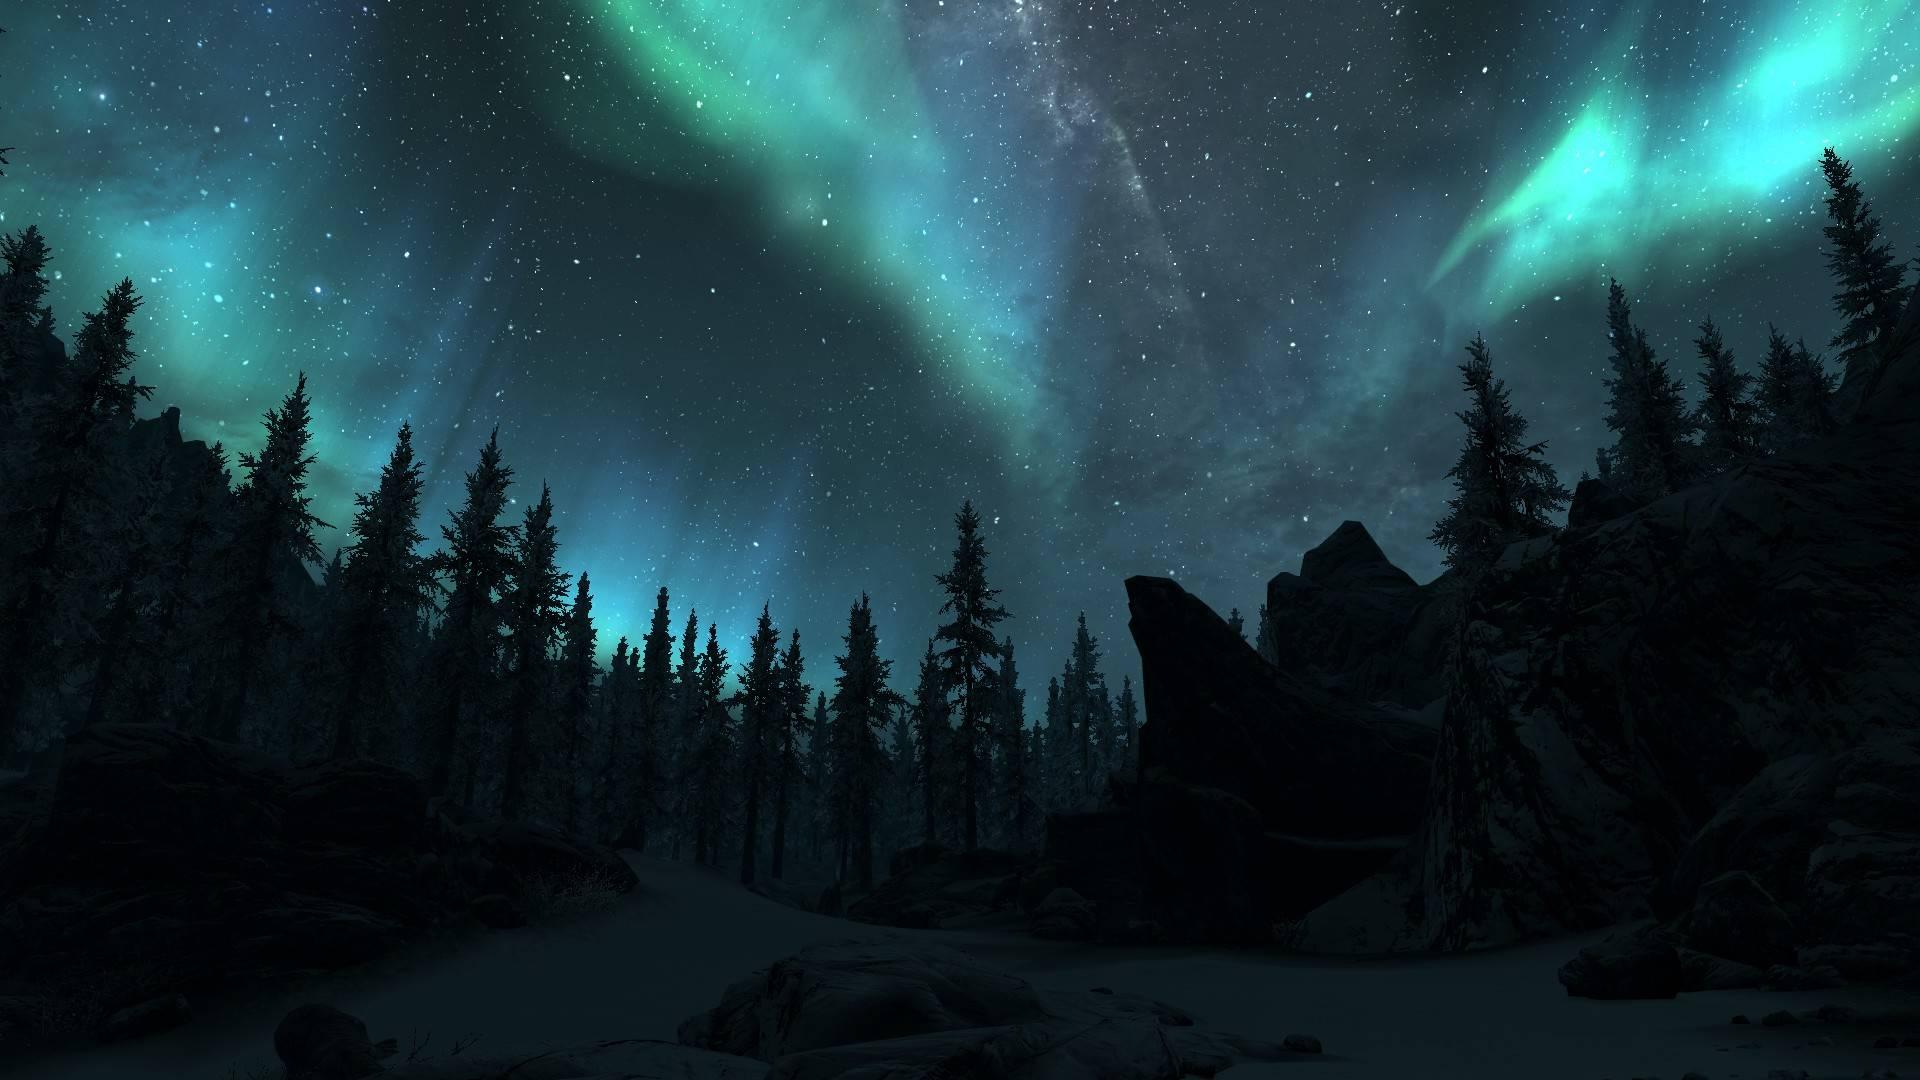 Blue Aurora Borealis - wallpaper